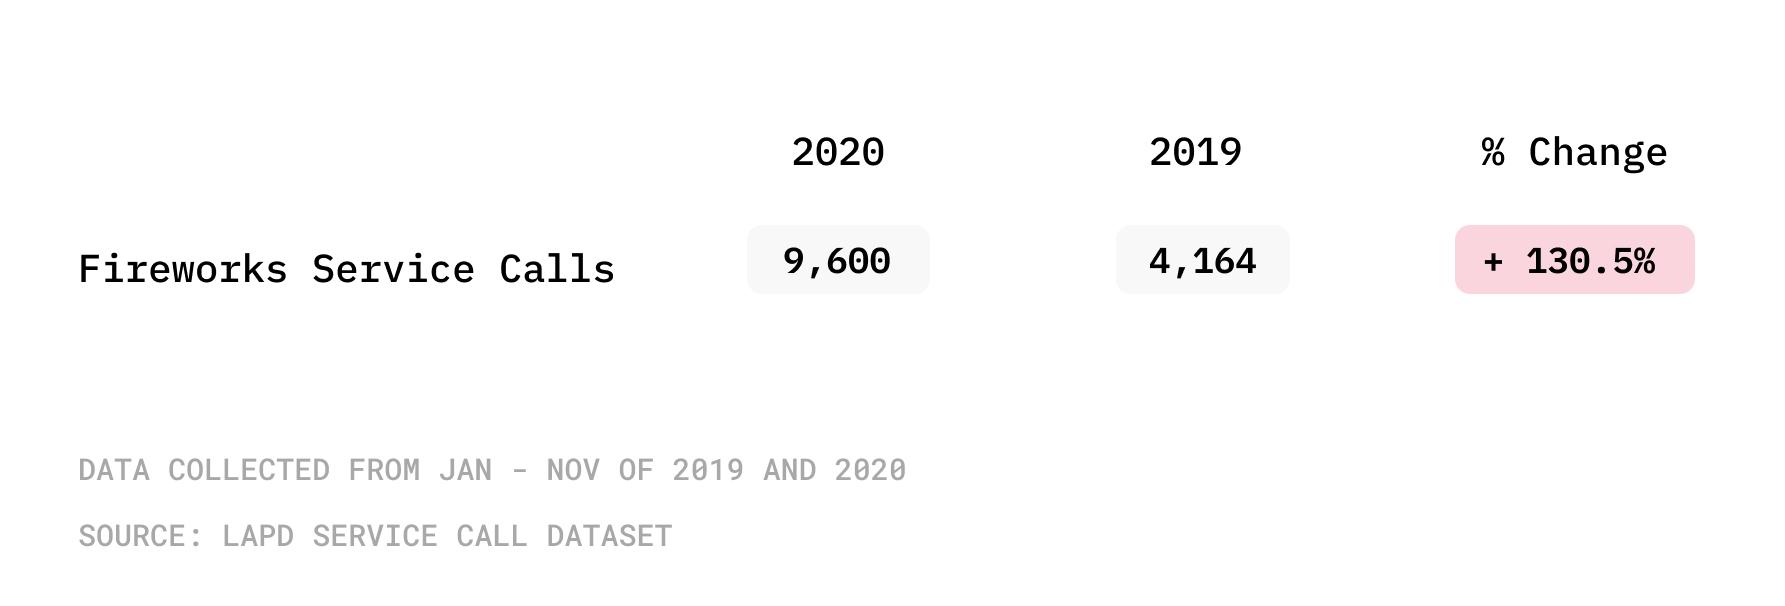 fireworks complaints 2020